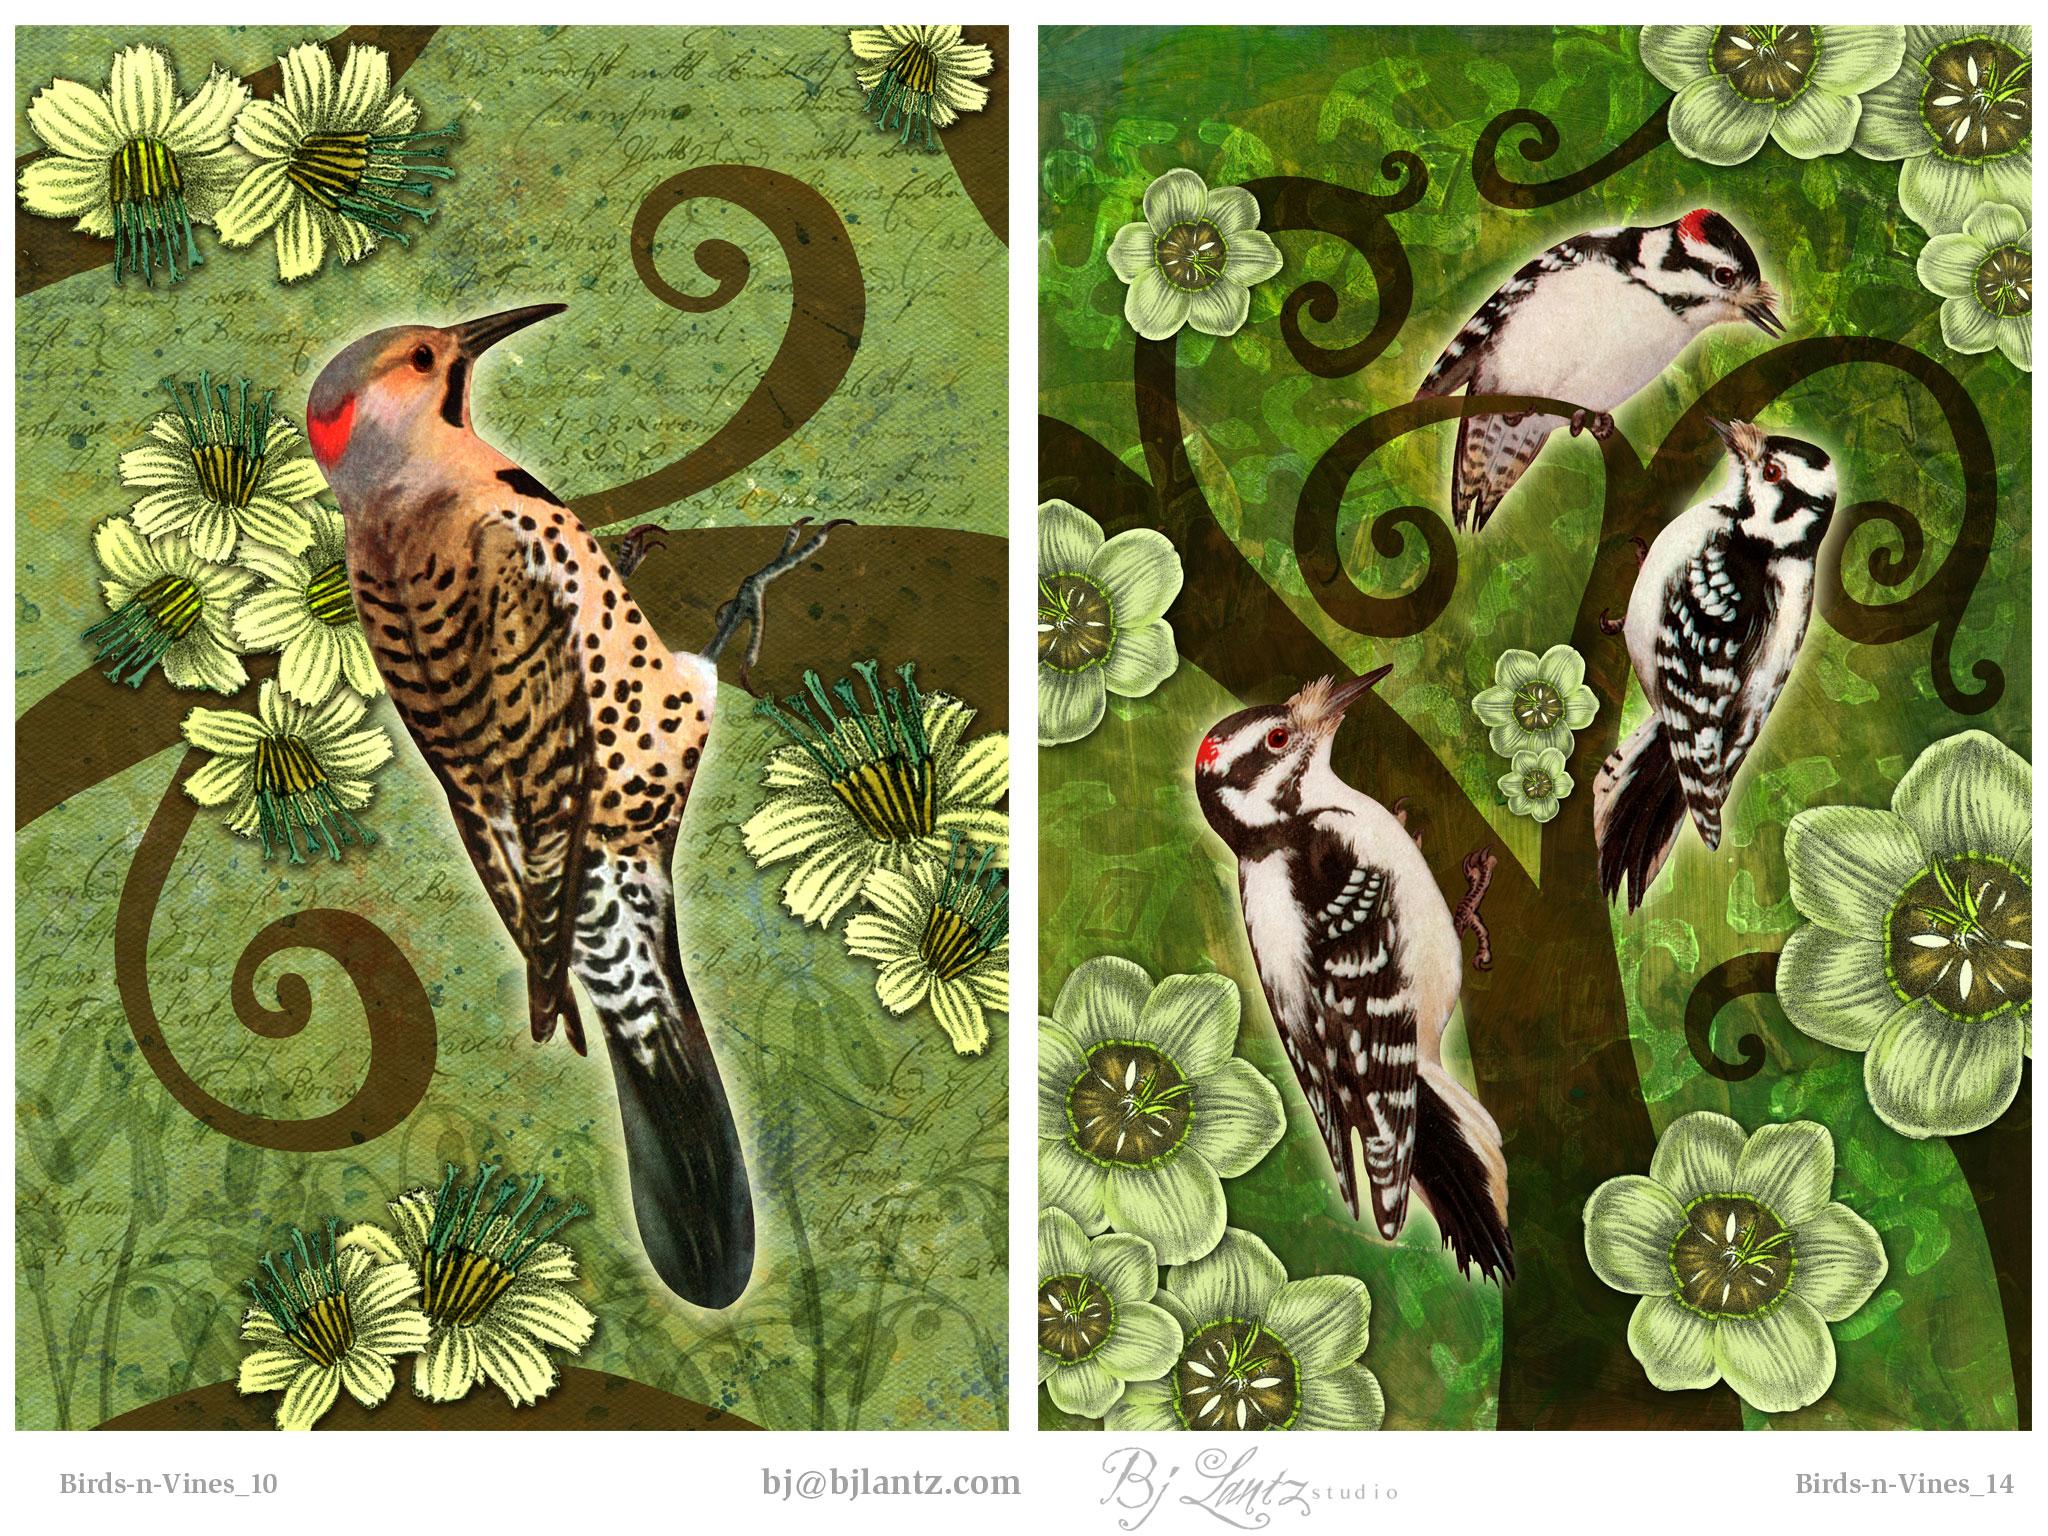 Birds-n-Vines_BJLantz_5.jpg